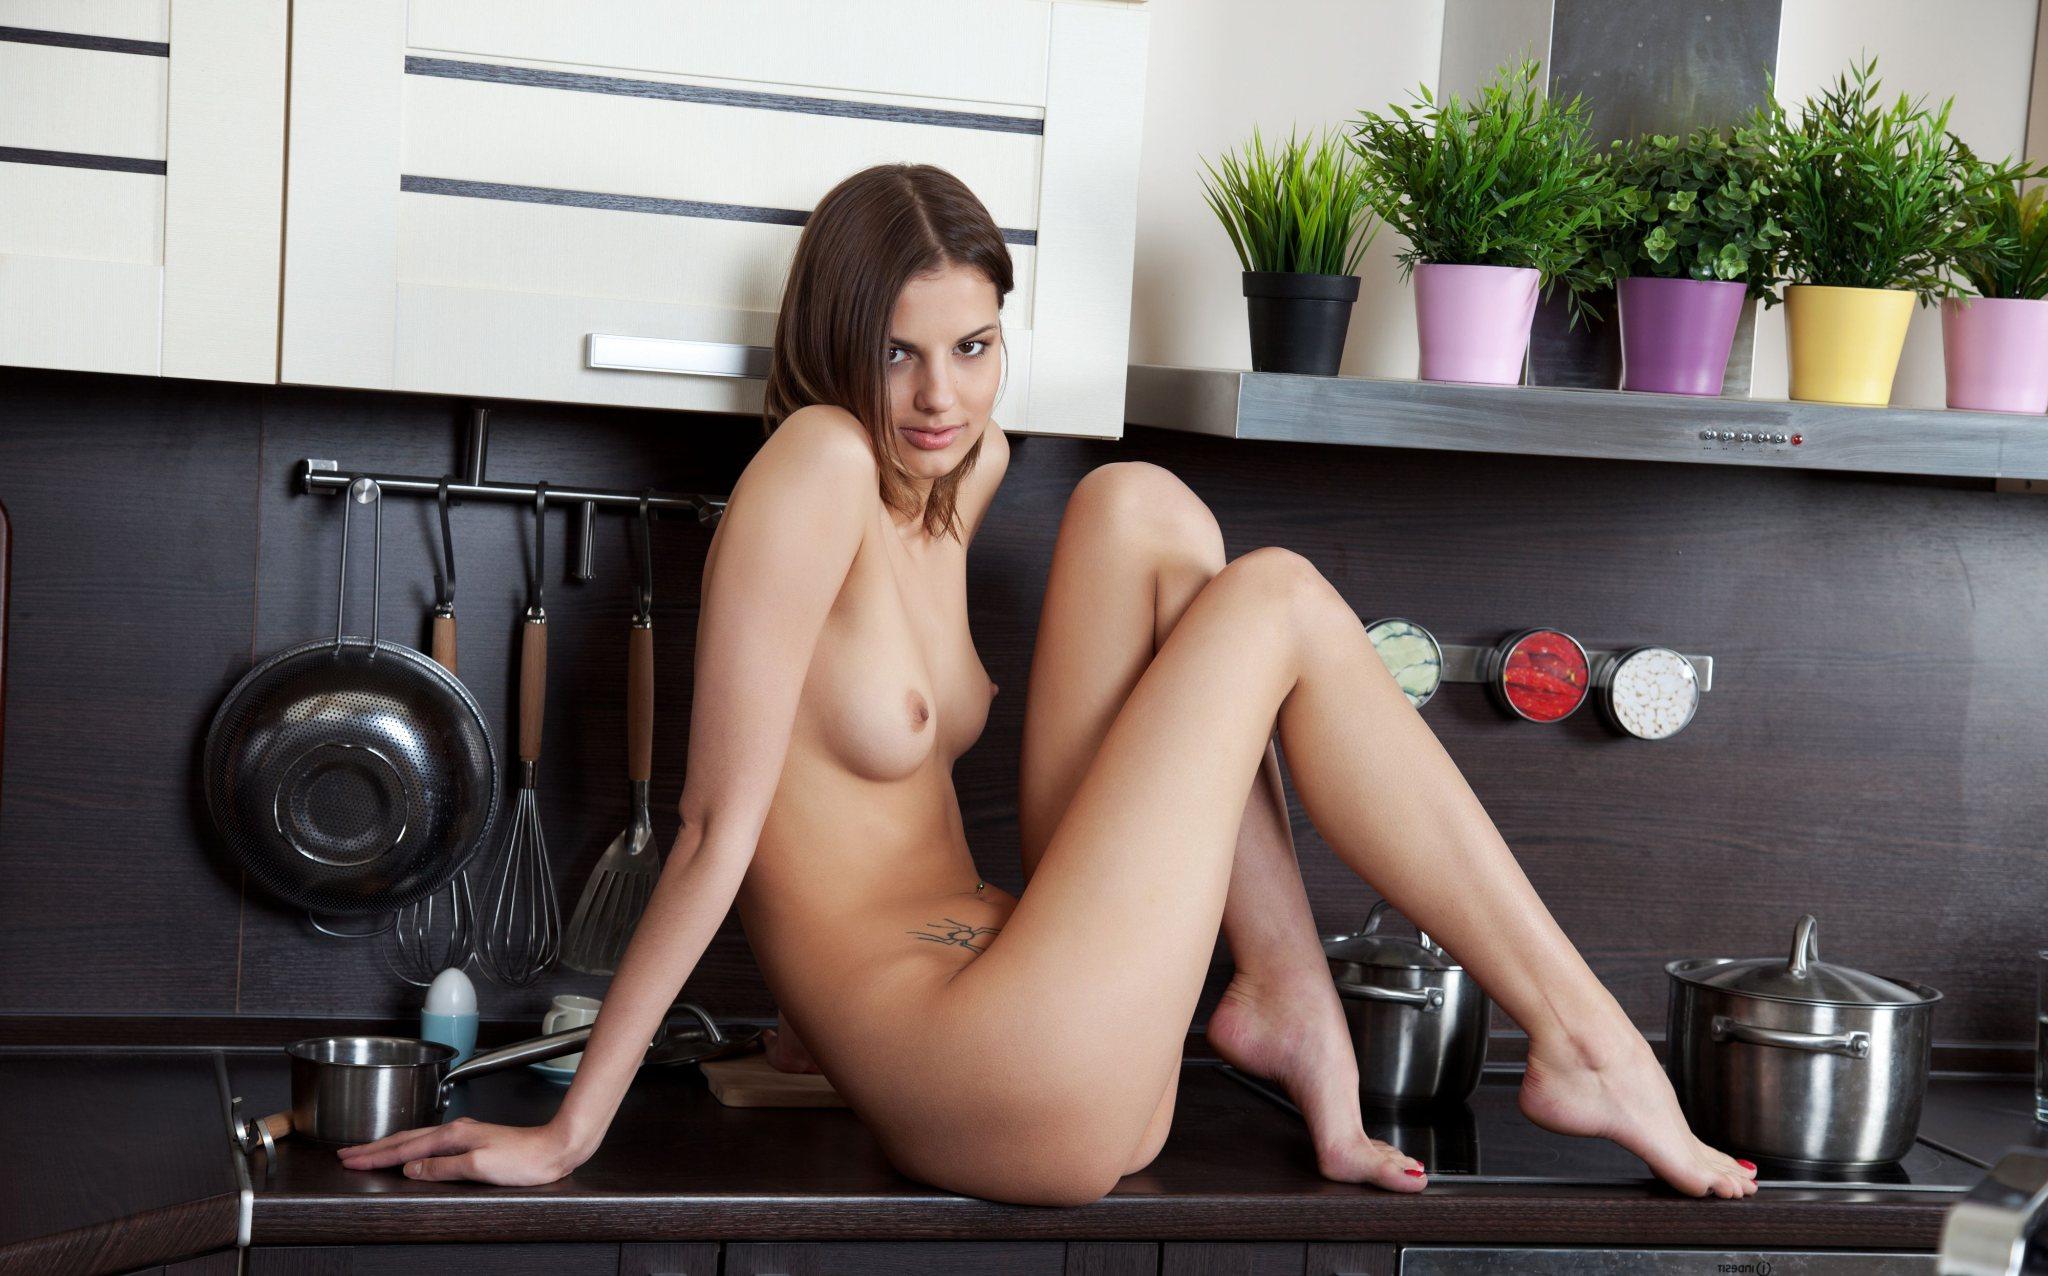 Фото тёлак голых в кухне